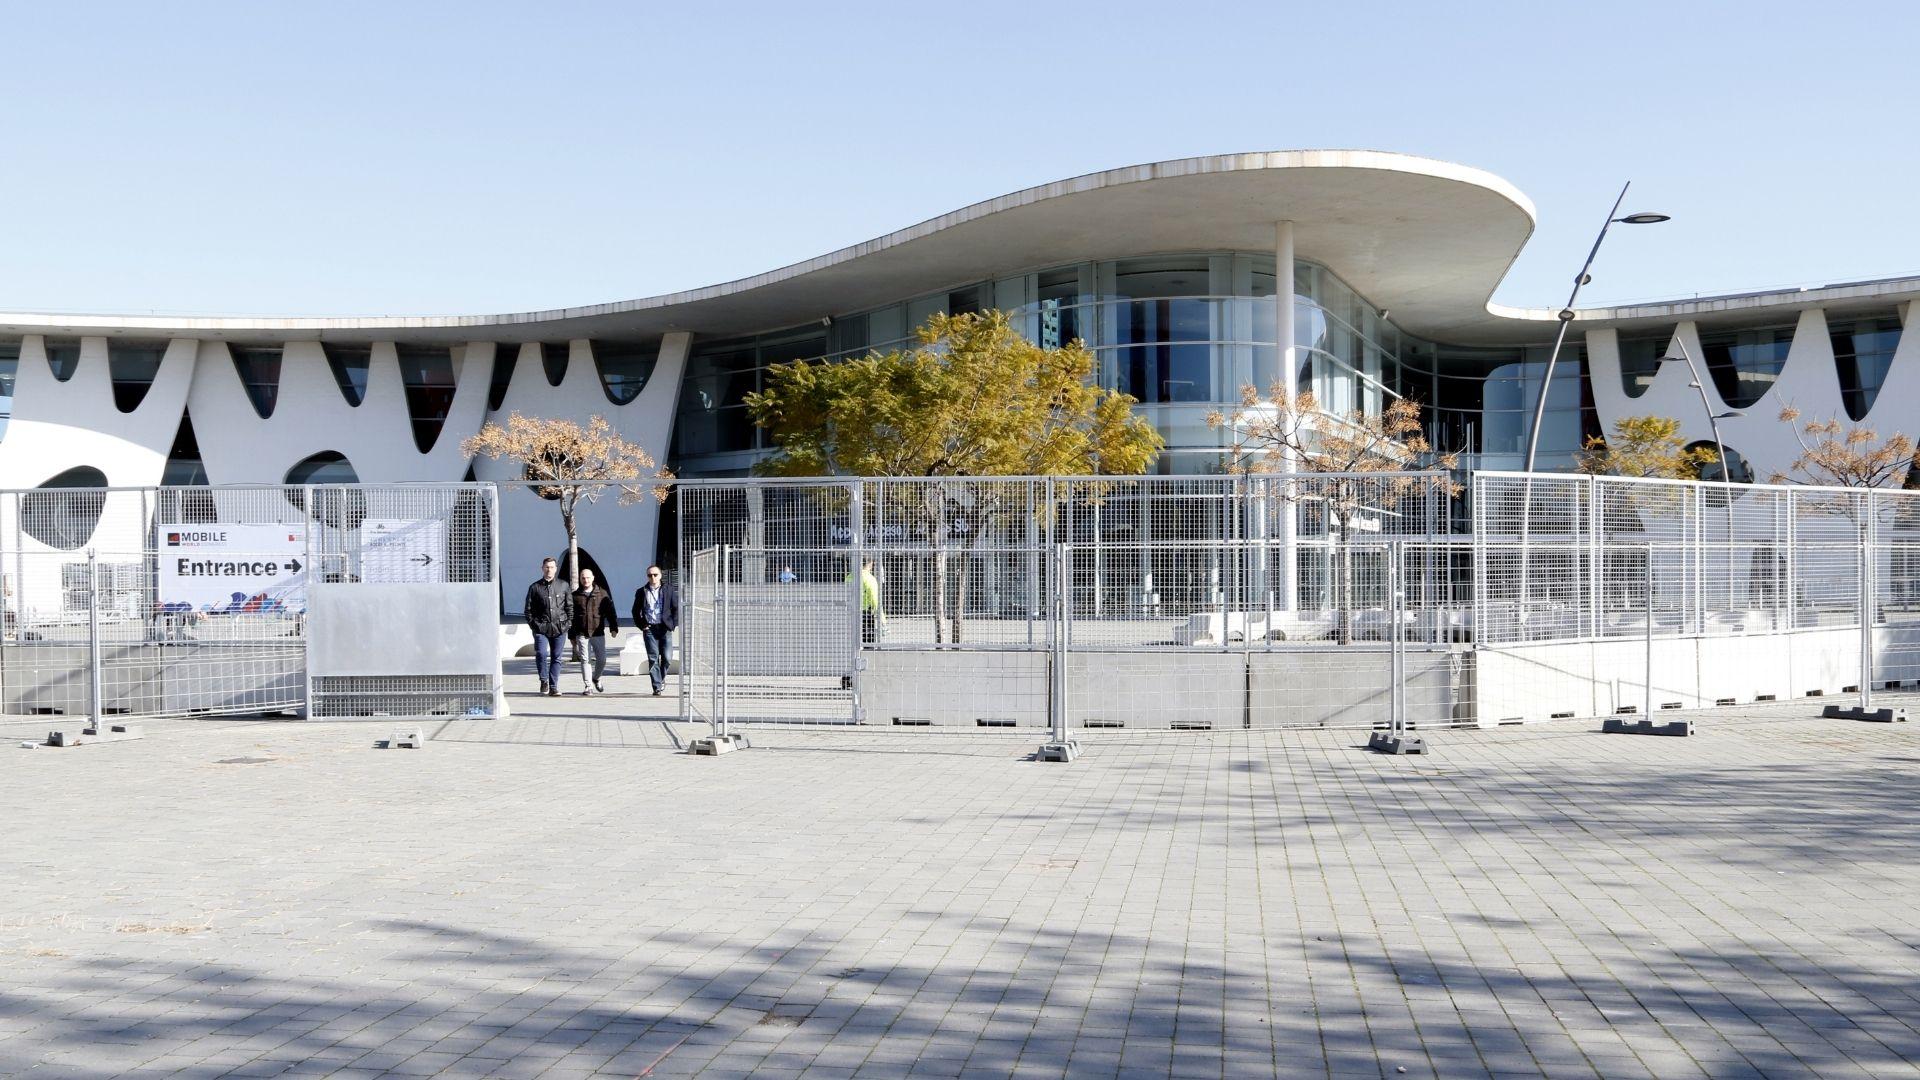 Fira de Barcelona MWC